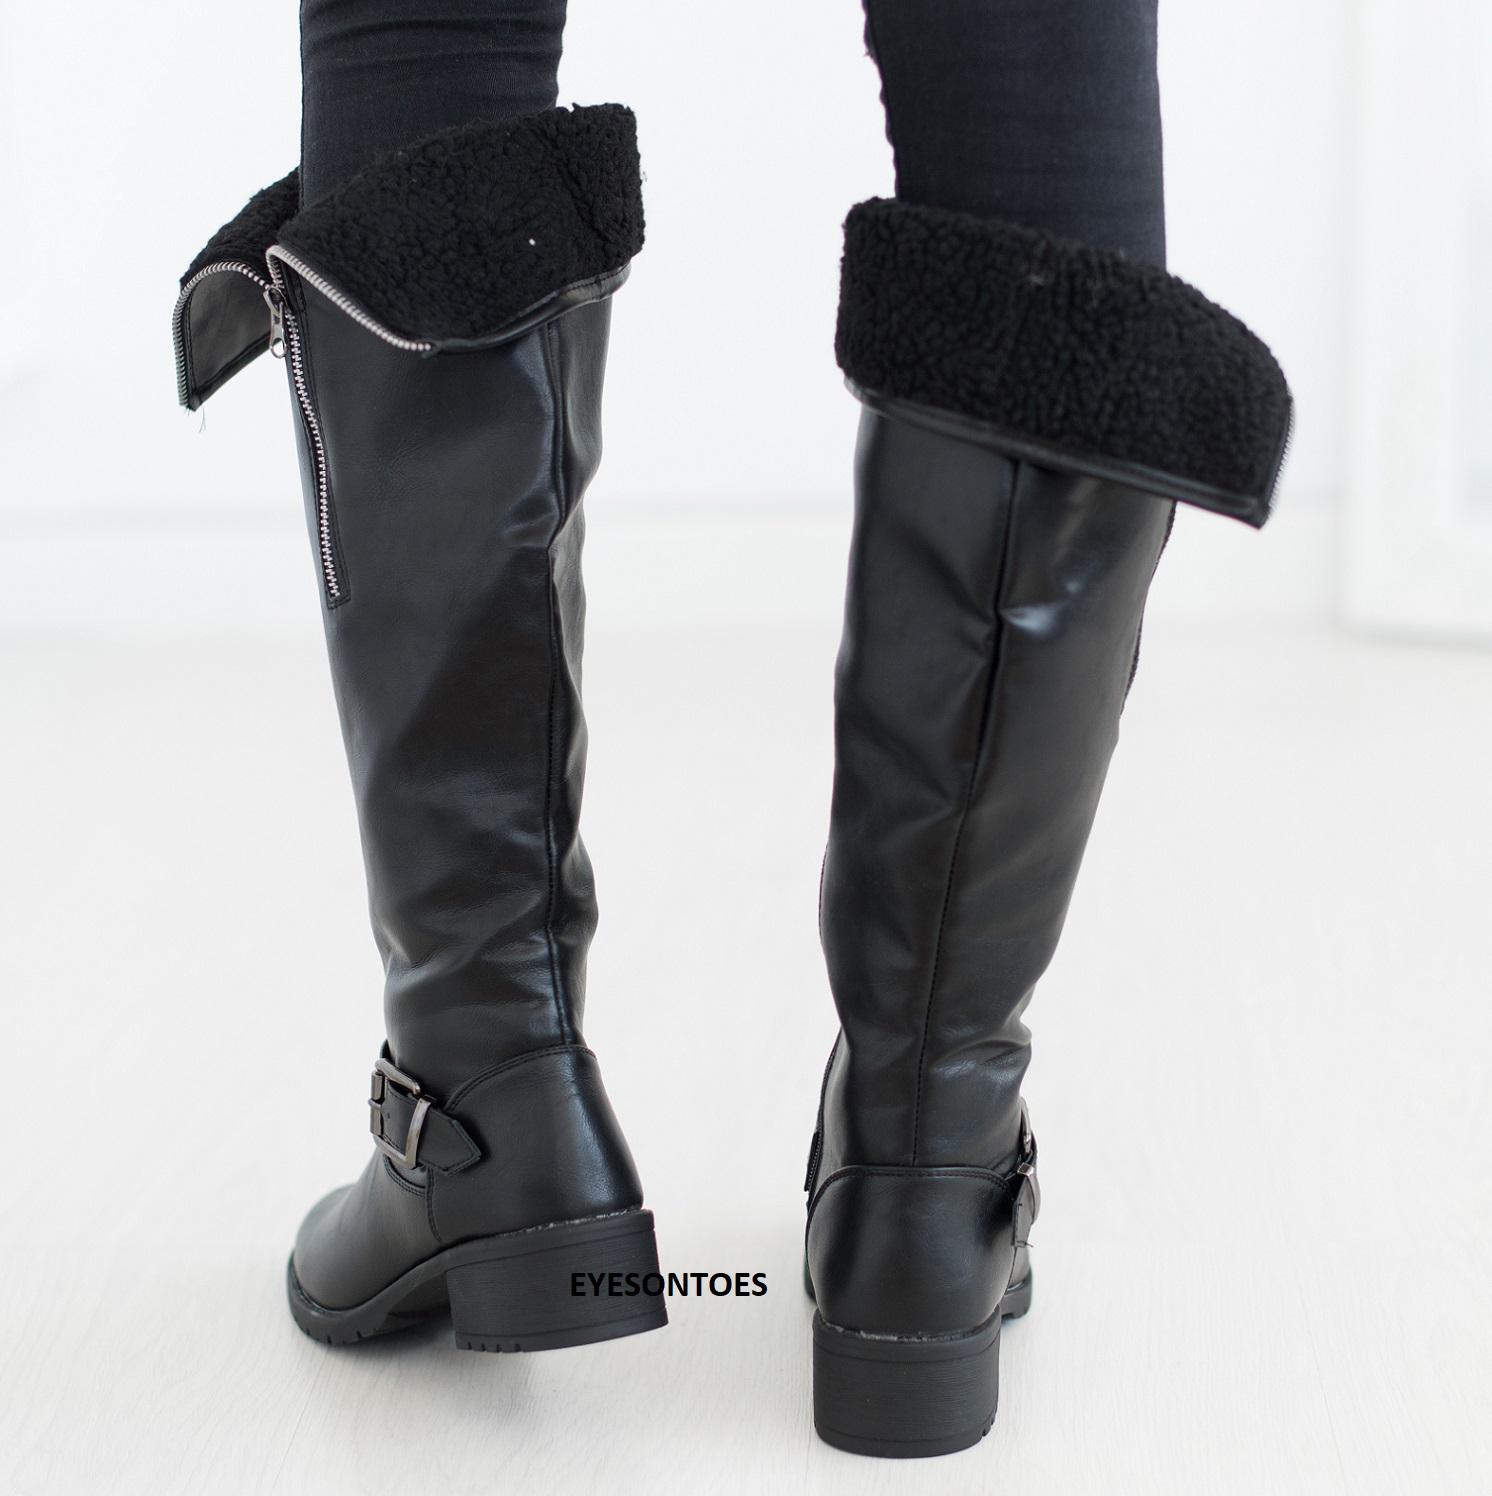 Ladie/'s Black Snug /& Warm Winter Fur Lined Knee High Boots Block Heel Uk 7